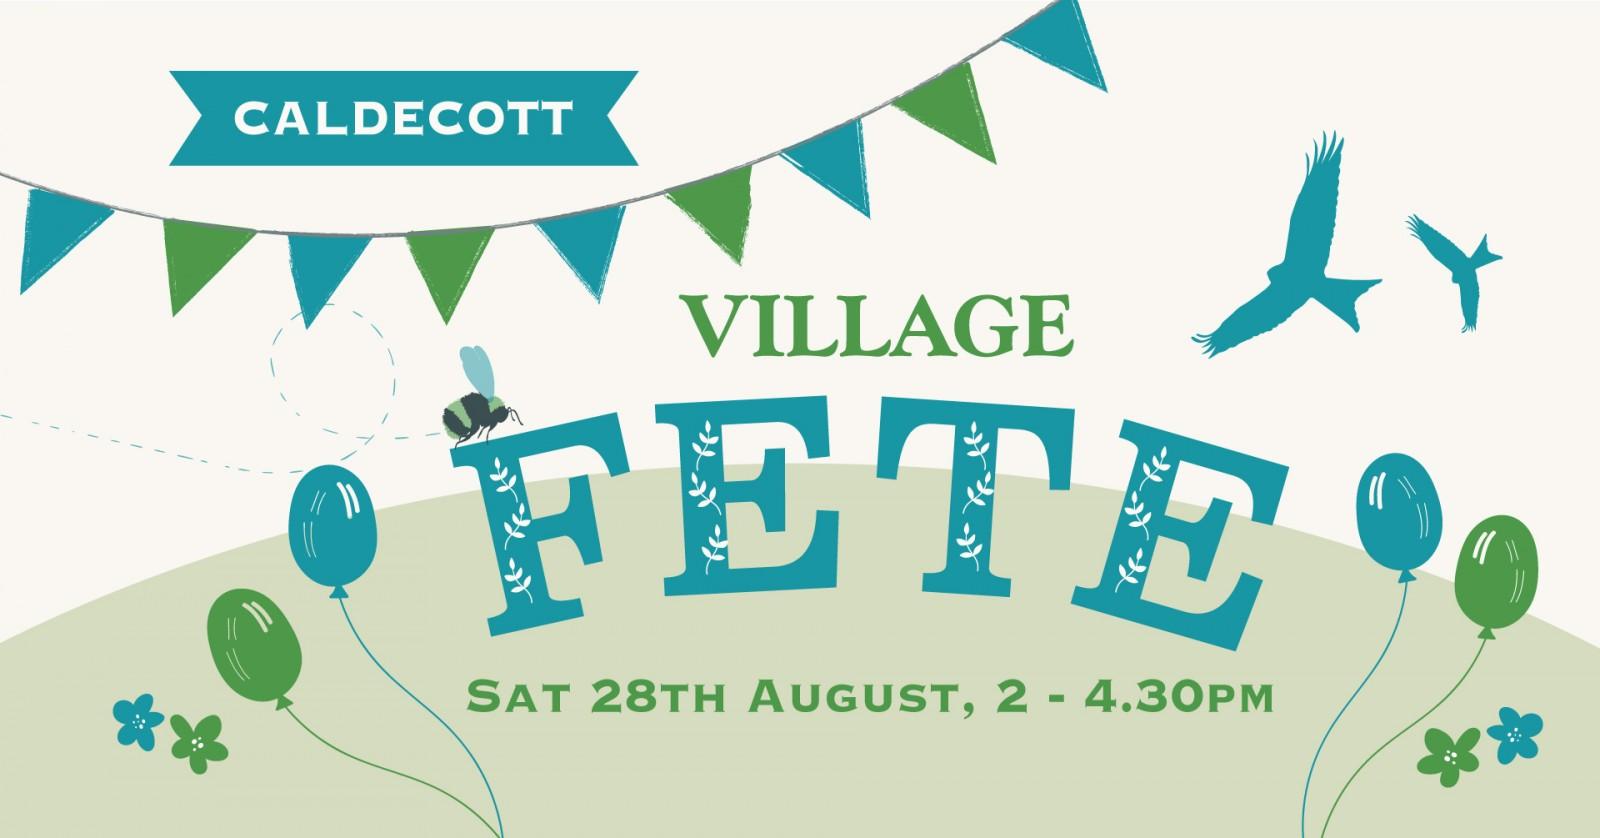 Caldecott Village Fete @ Caldecott Village Hall